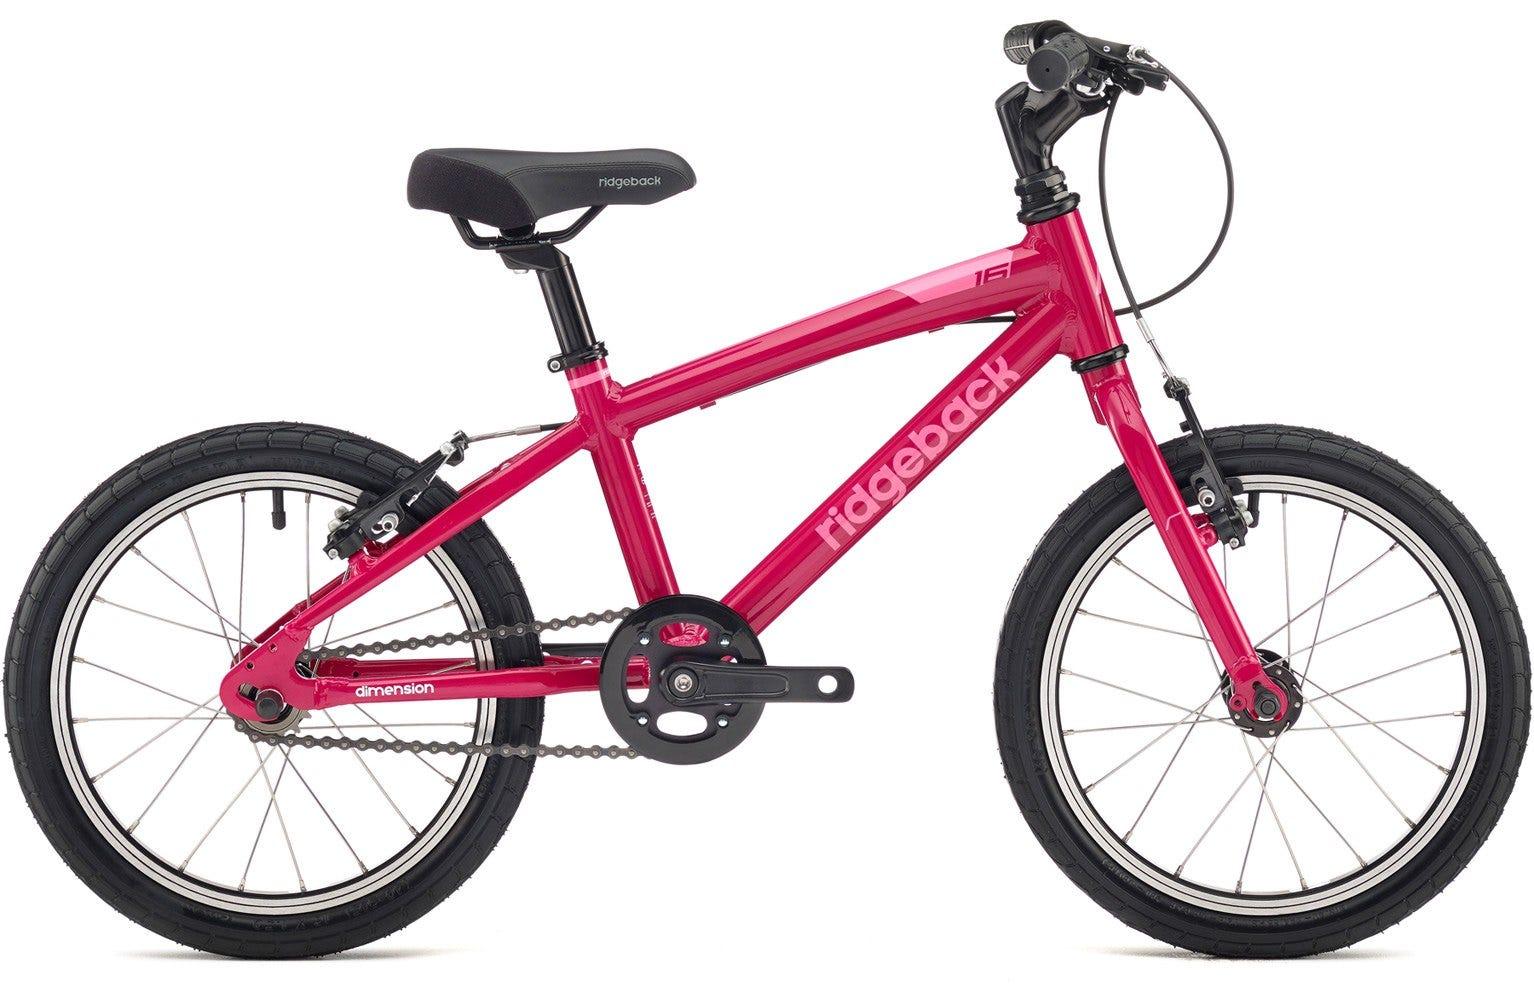 Ridgeback Dimension 16 inch bike pink Ex Display Bike